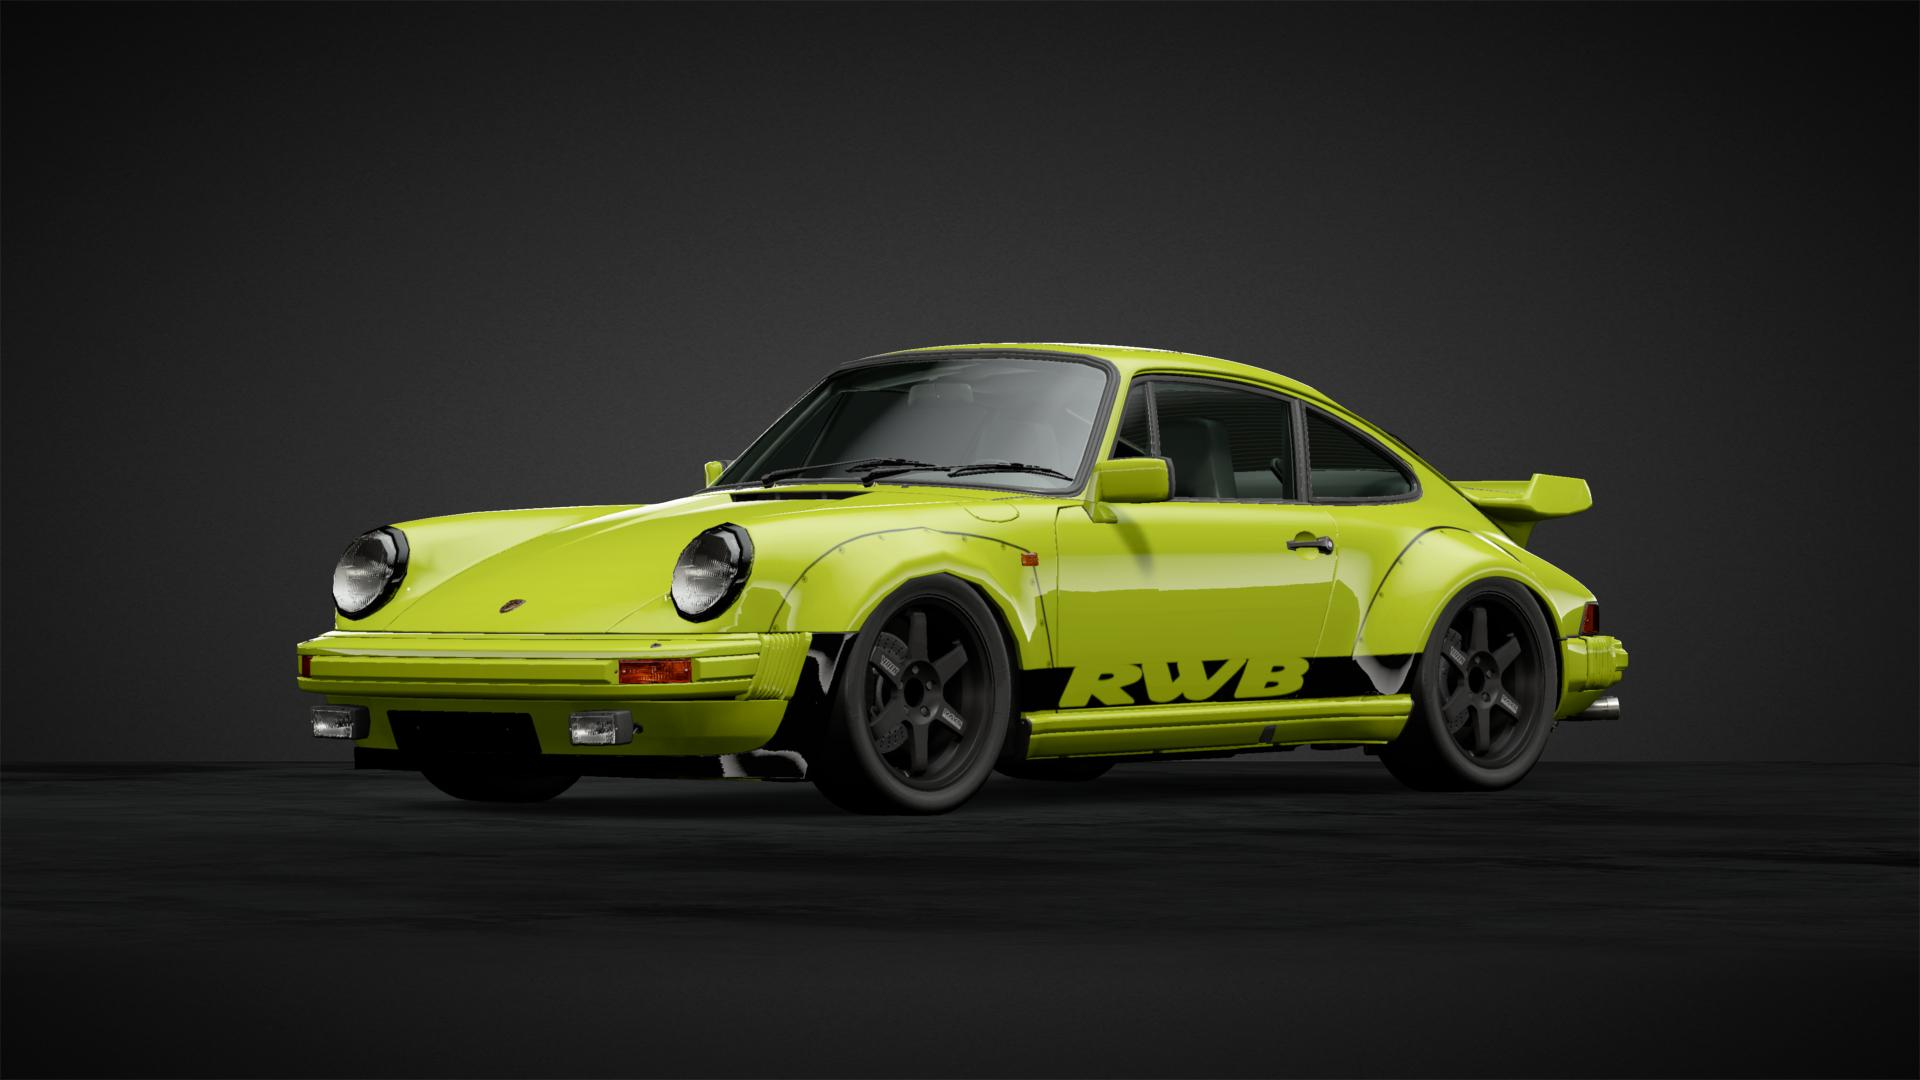 Porsche 911 Turbo Rwb Car Livery By Stez 70 Community Gran Turismo Sport